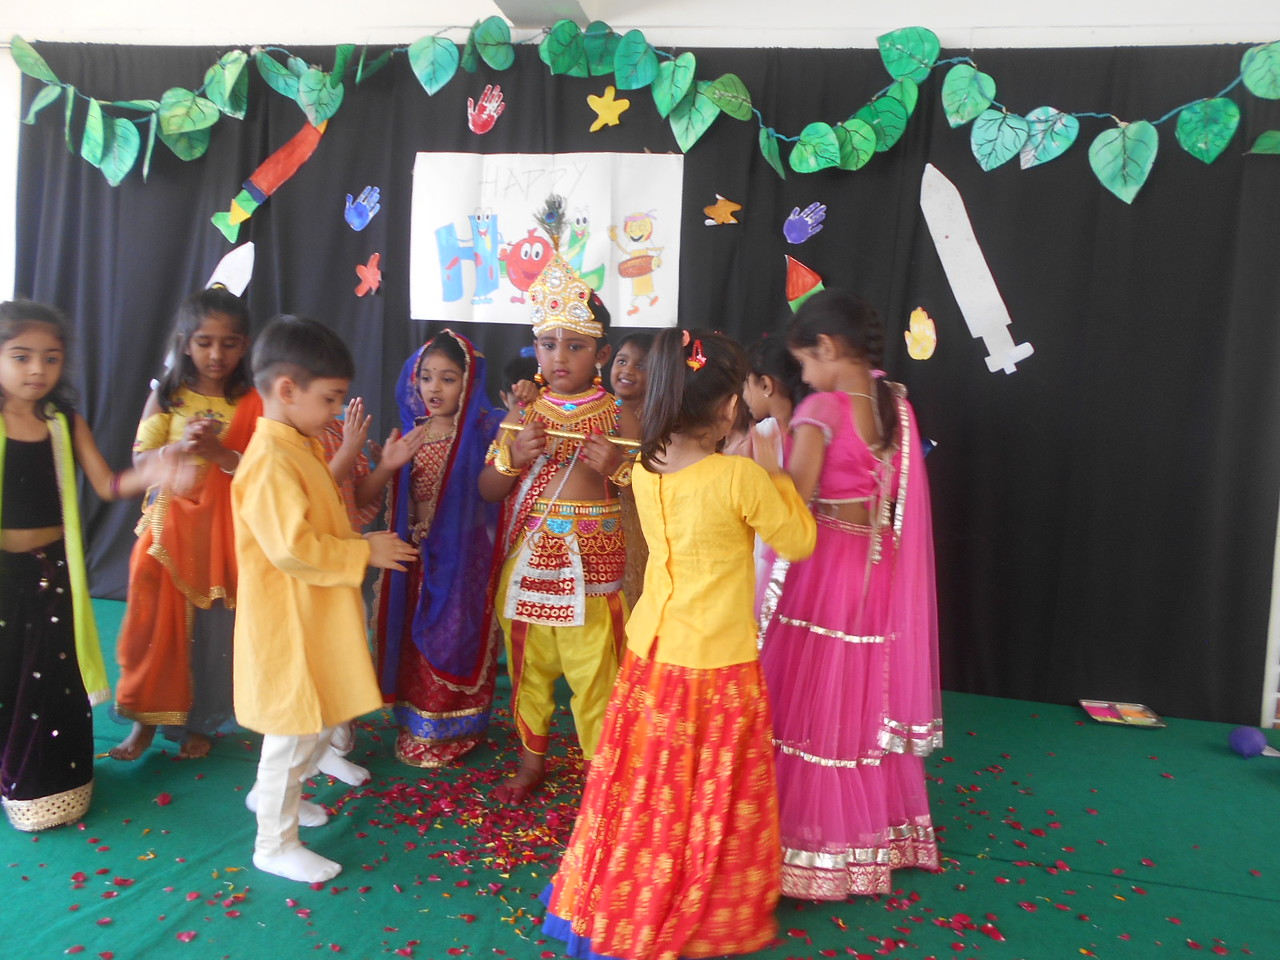 PLAYING HOLI WITH RADHA KRISHNA USING FLOWERS